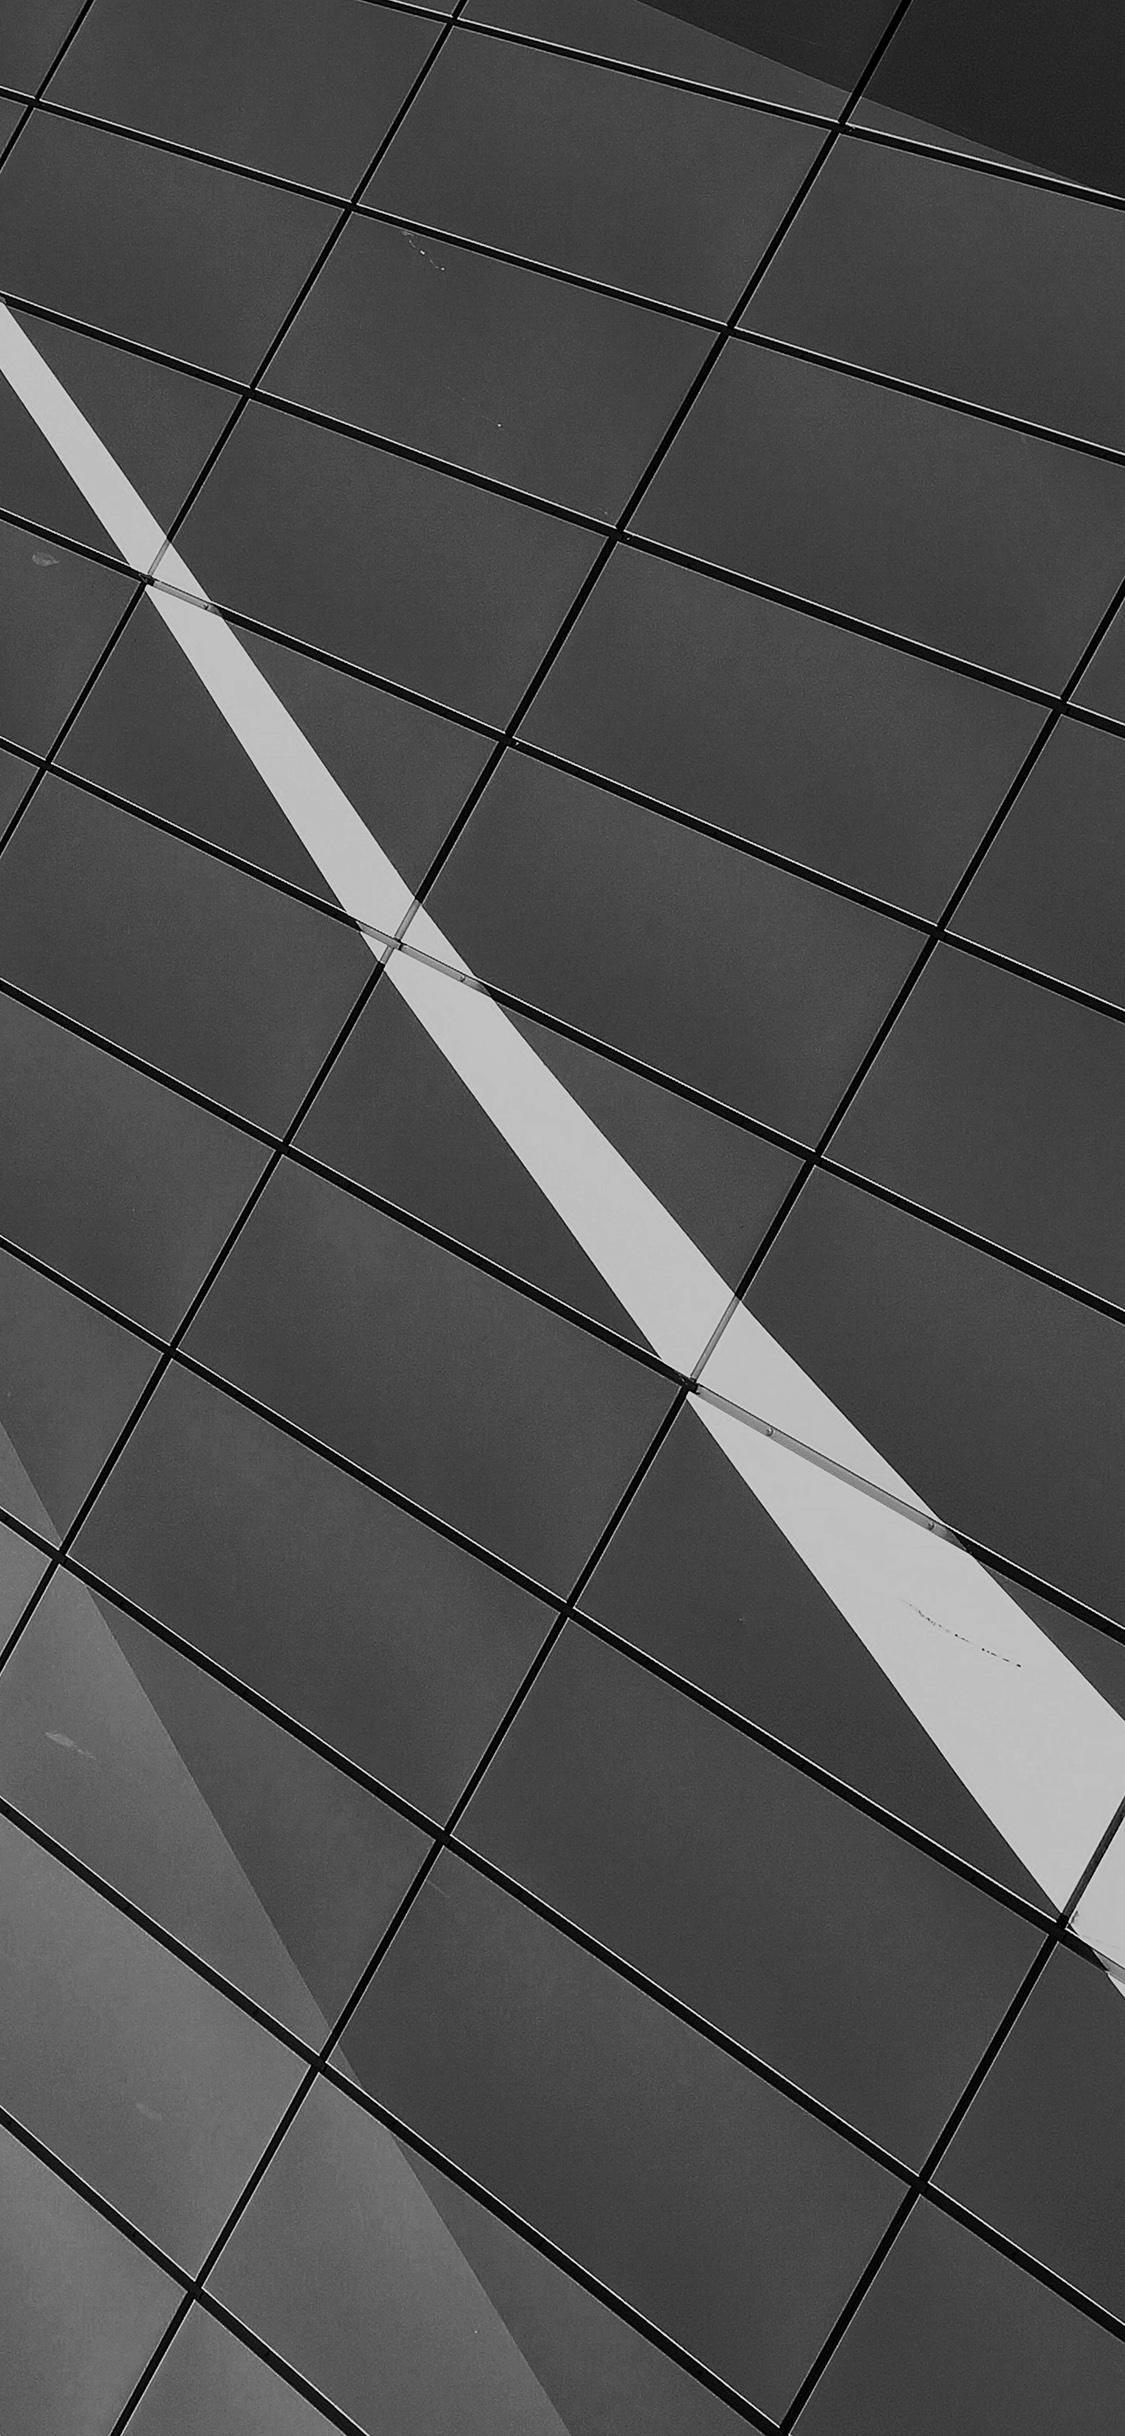 iPhonexpapers.com-Apple-iPhone-wallpaper-vr18-building-window-bw-pattern-dark